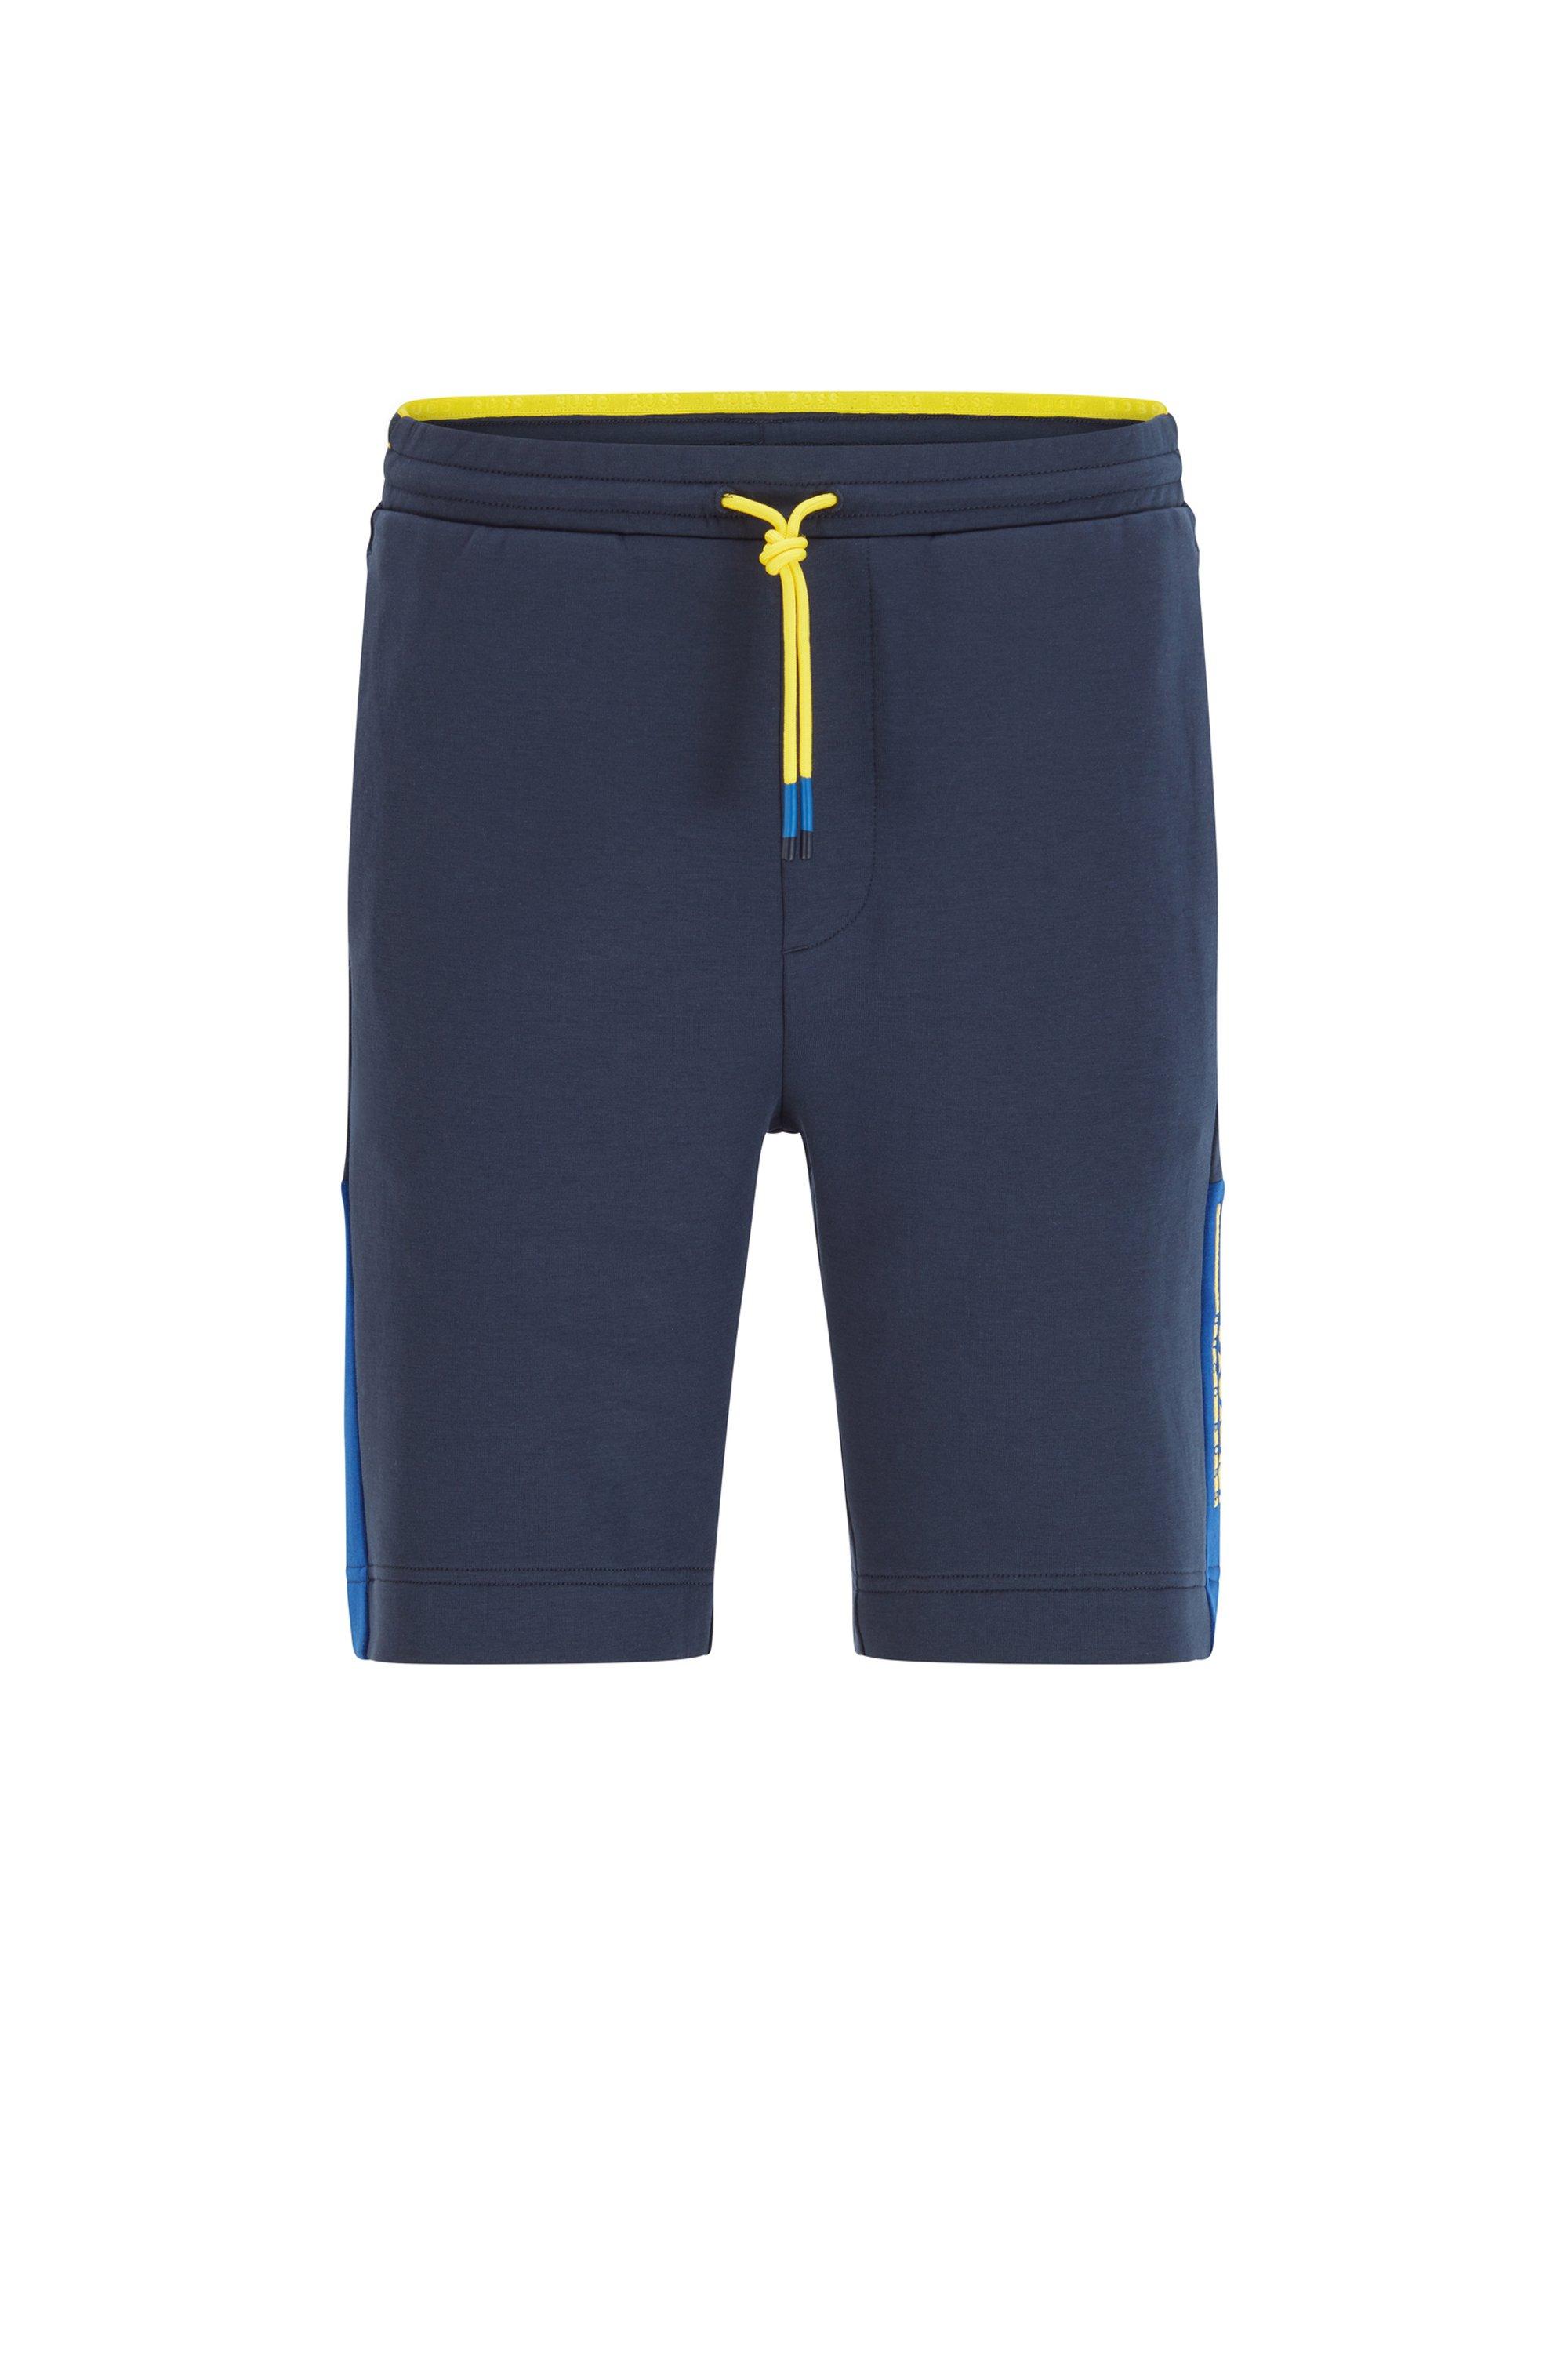 Short en jersey interlock avec logo color block, Bleu foncé